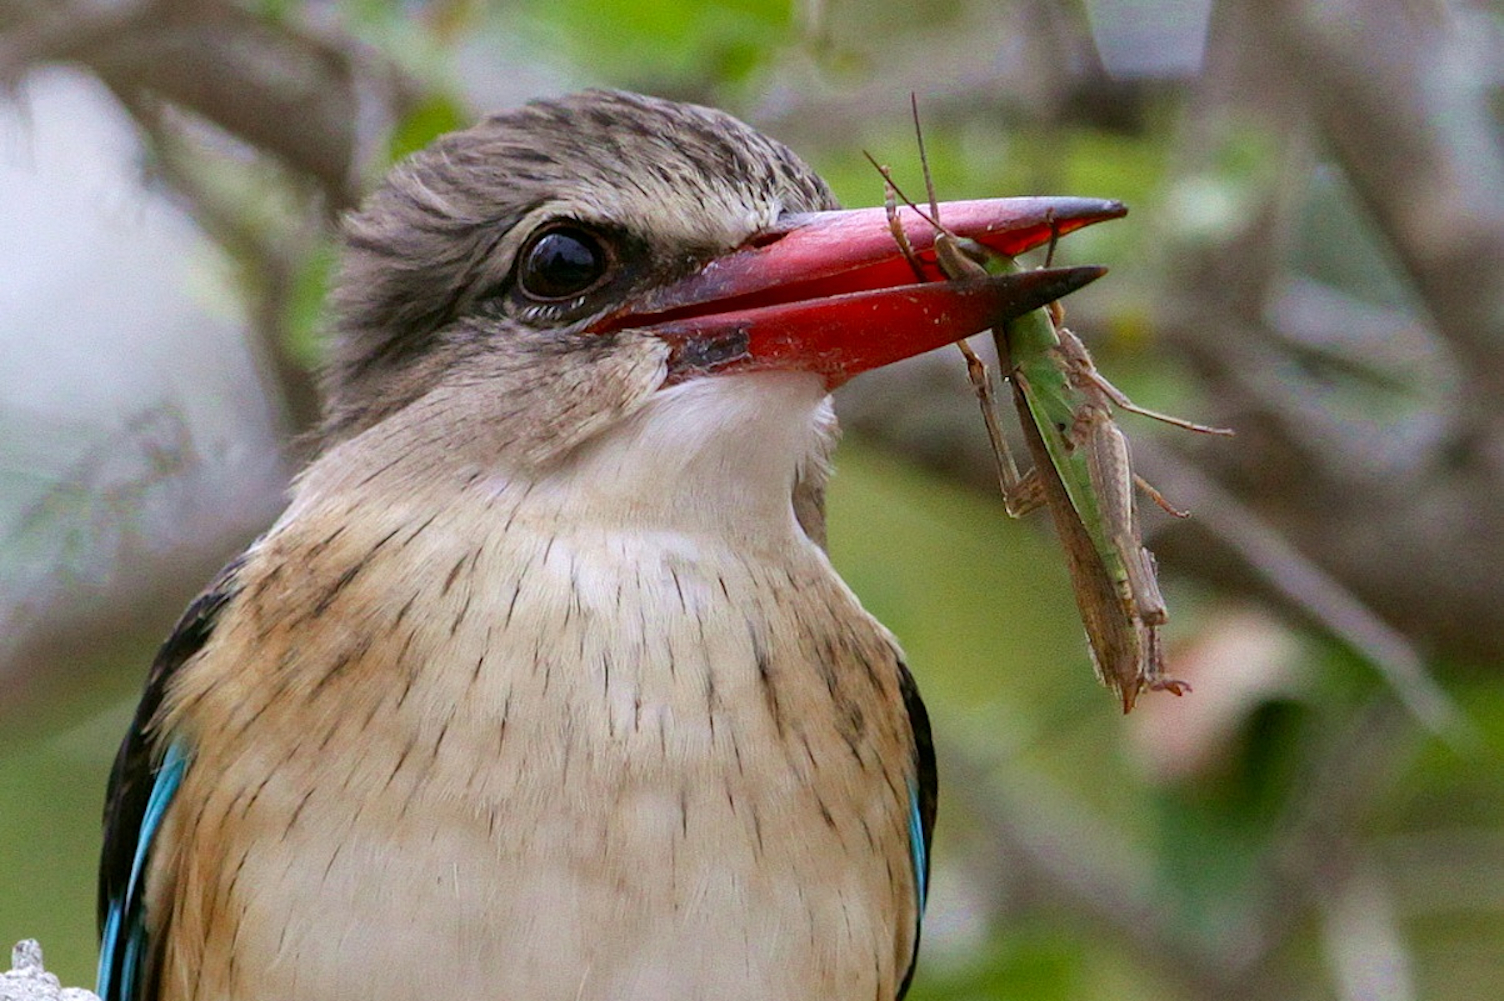 Brownhooded-Kingfisher-with-Locust_Peter-Pischler